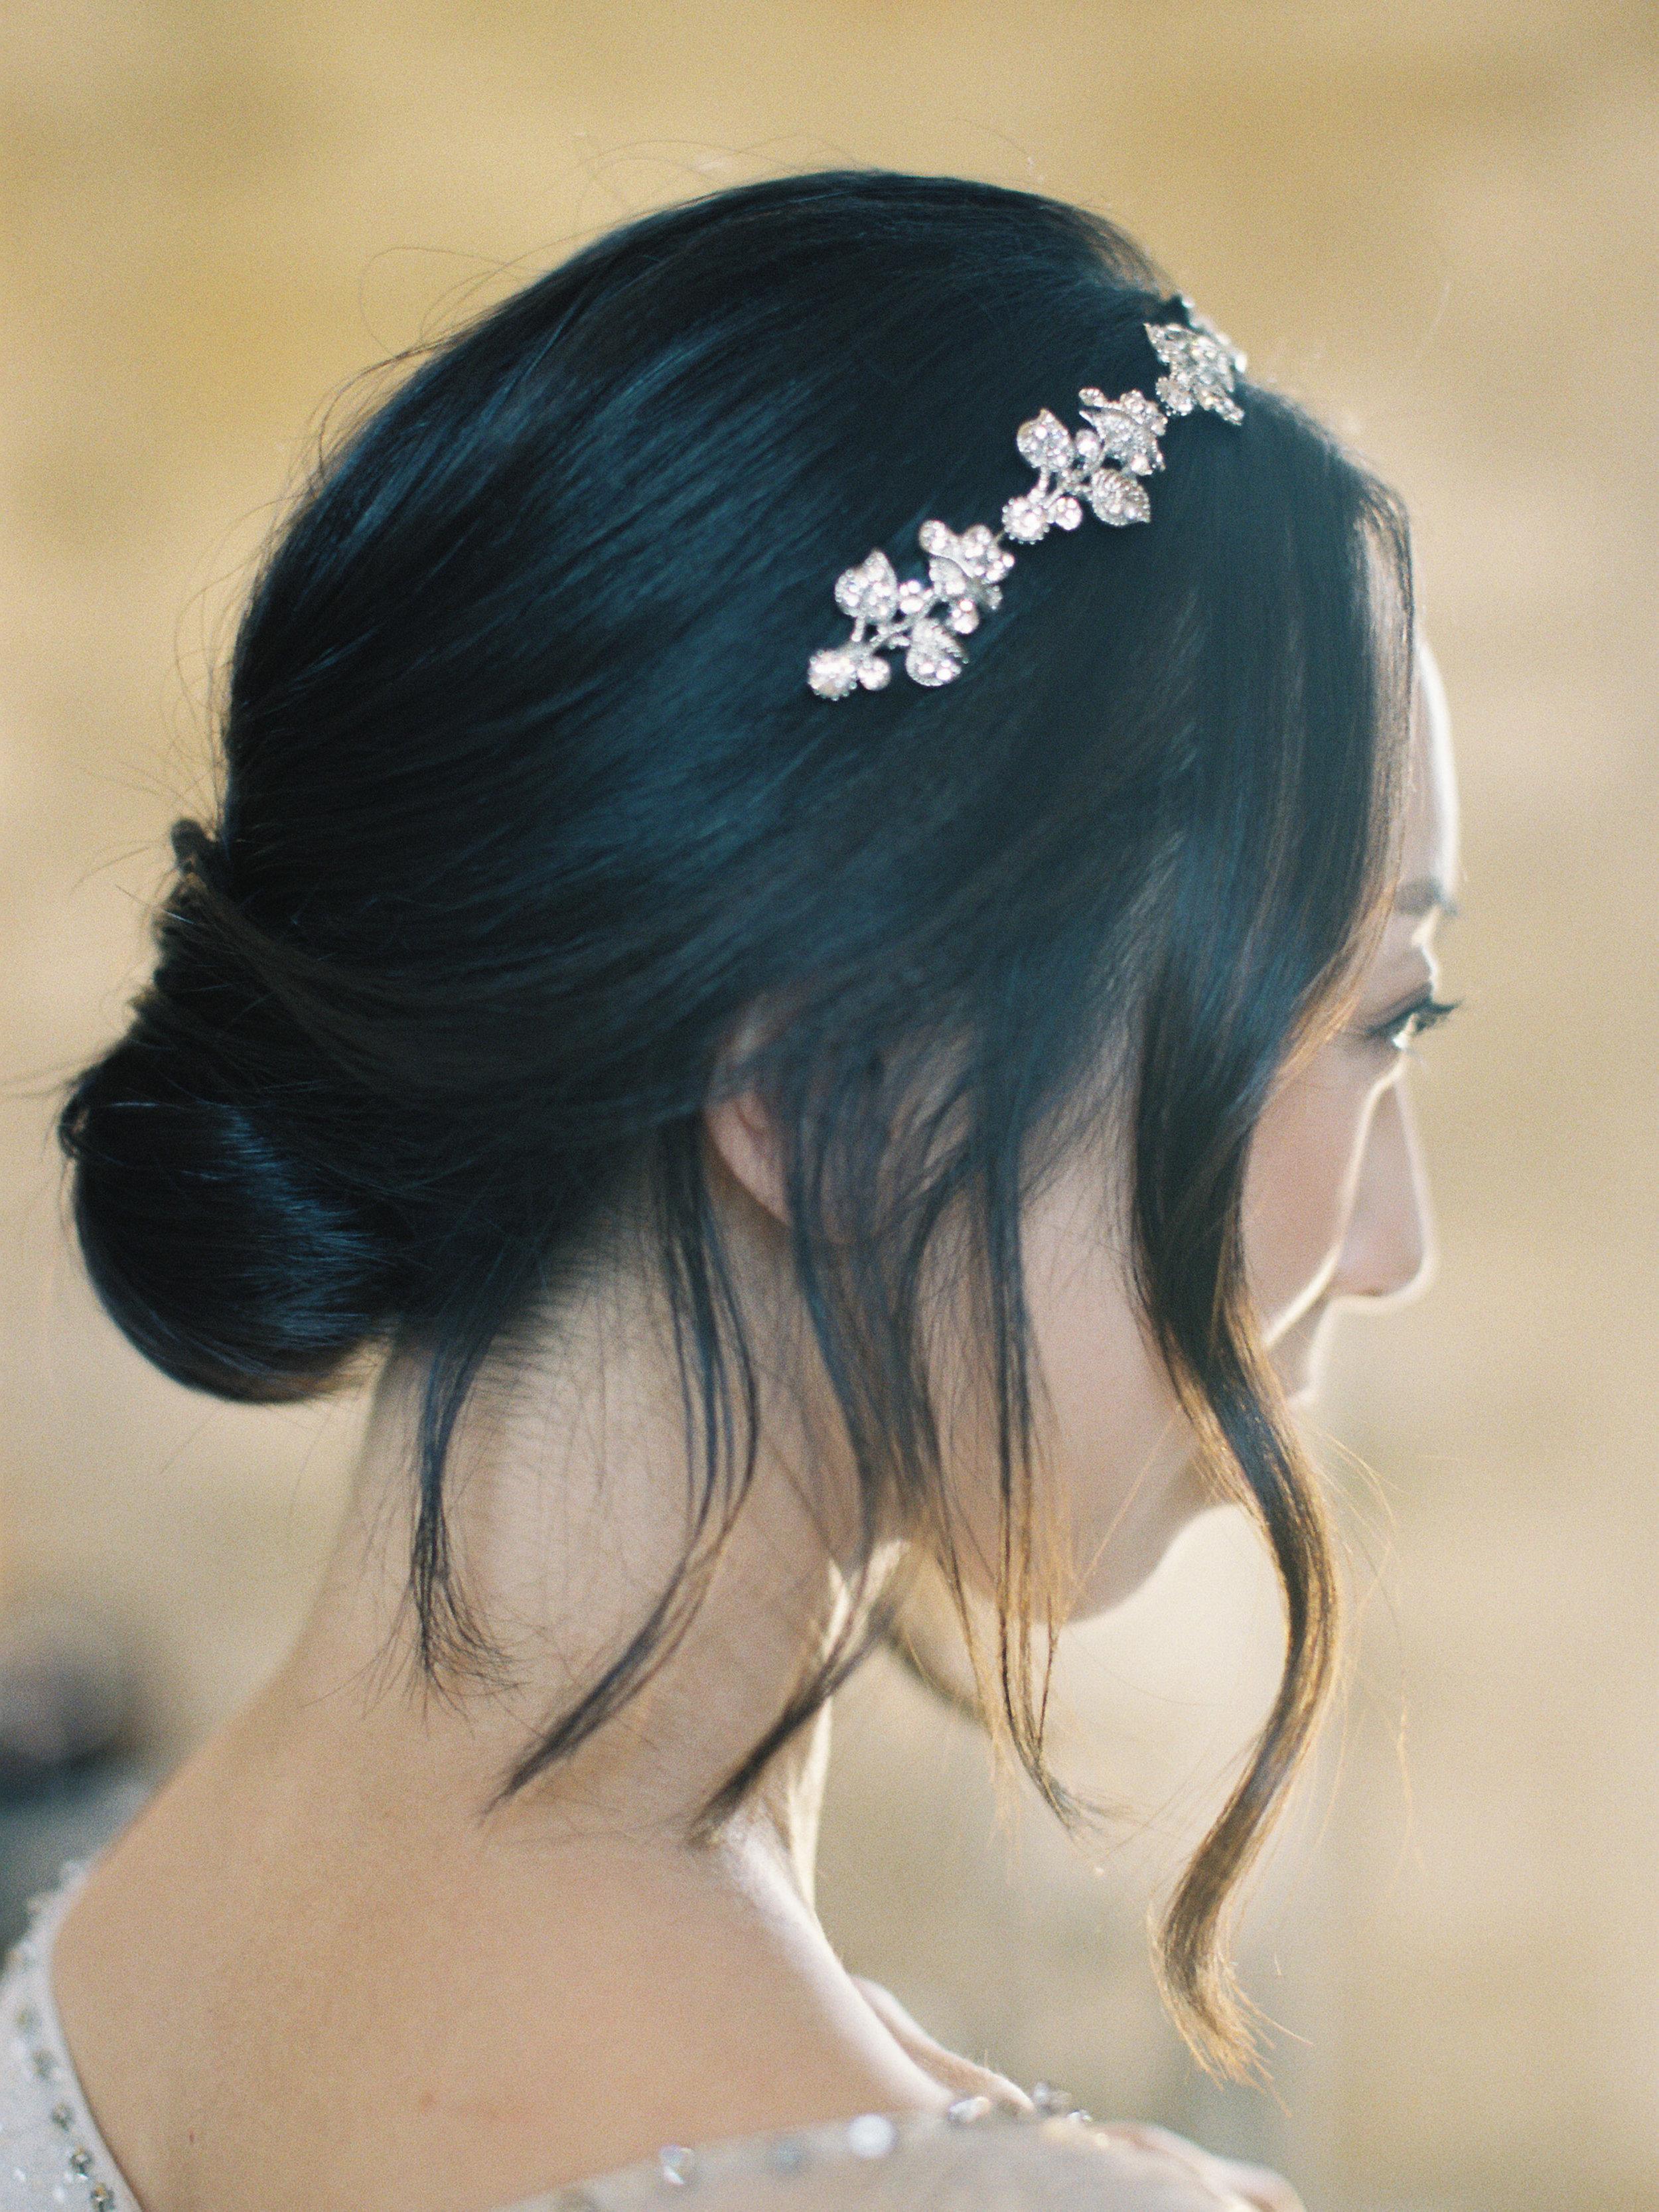 JK-Editorial-45-Jen-Huang-008713-R1-031.jpg